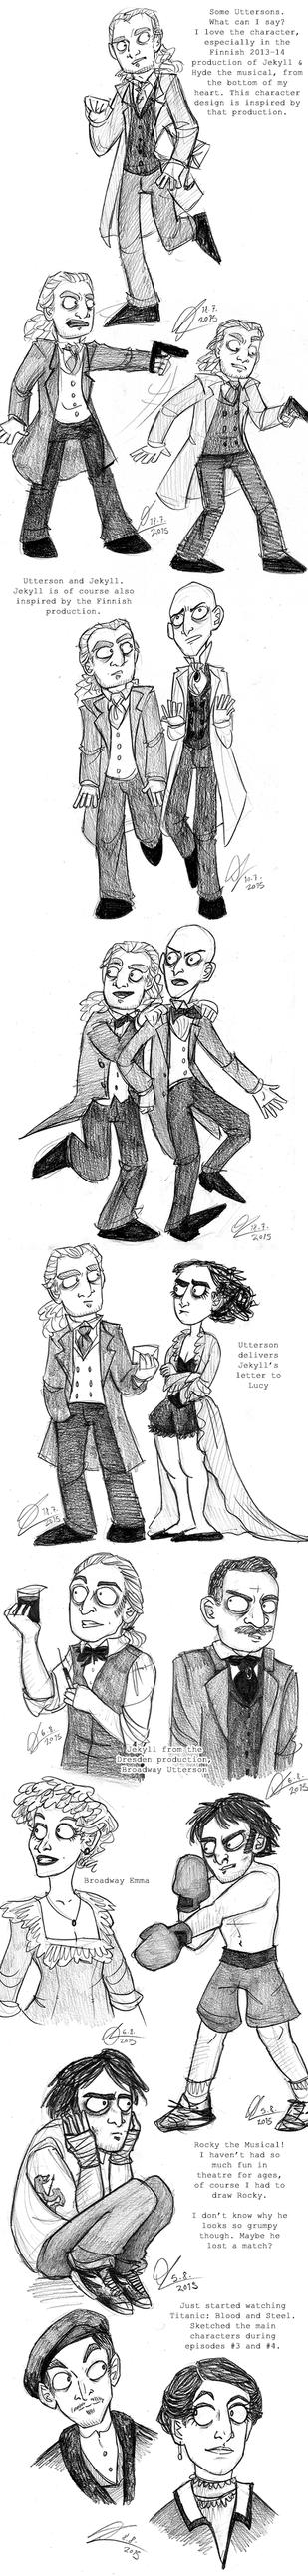 Pencil Sketchdump by Starlene